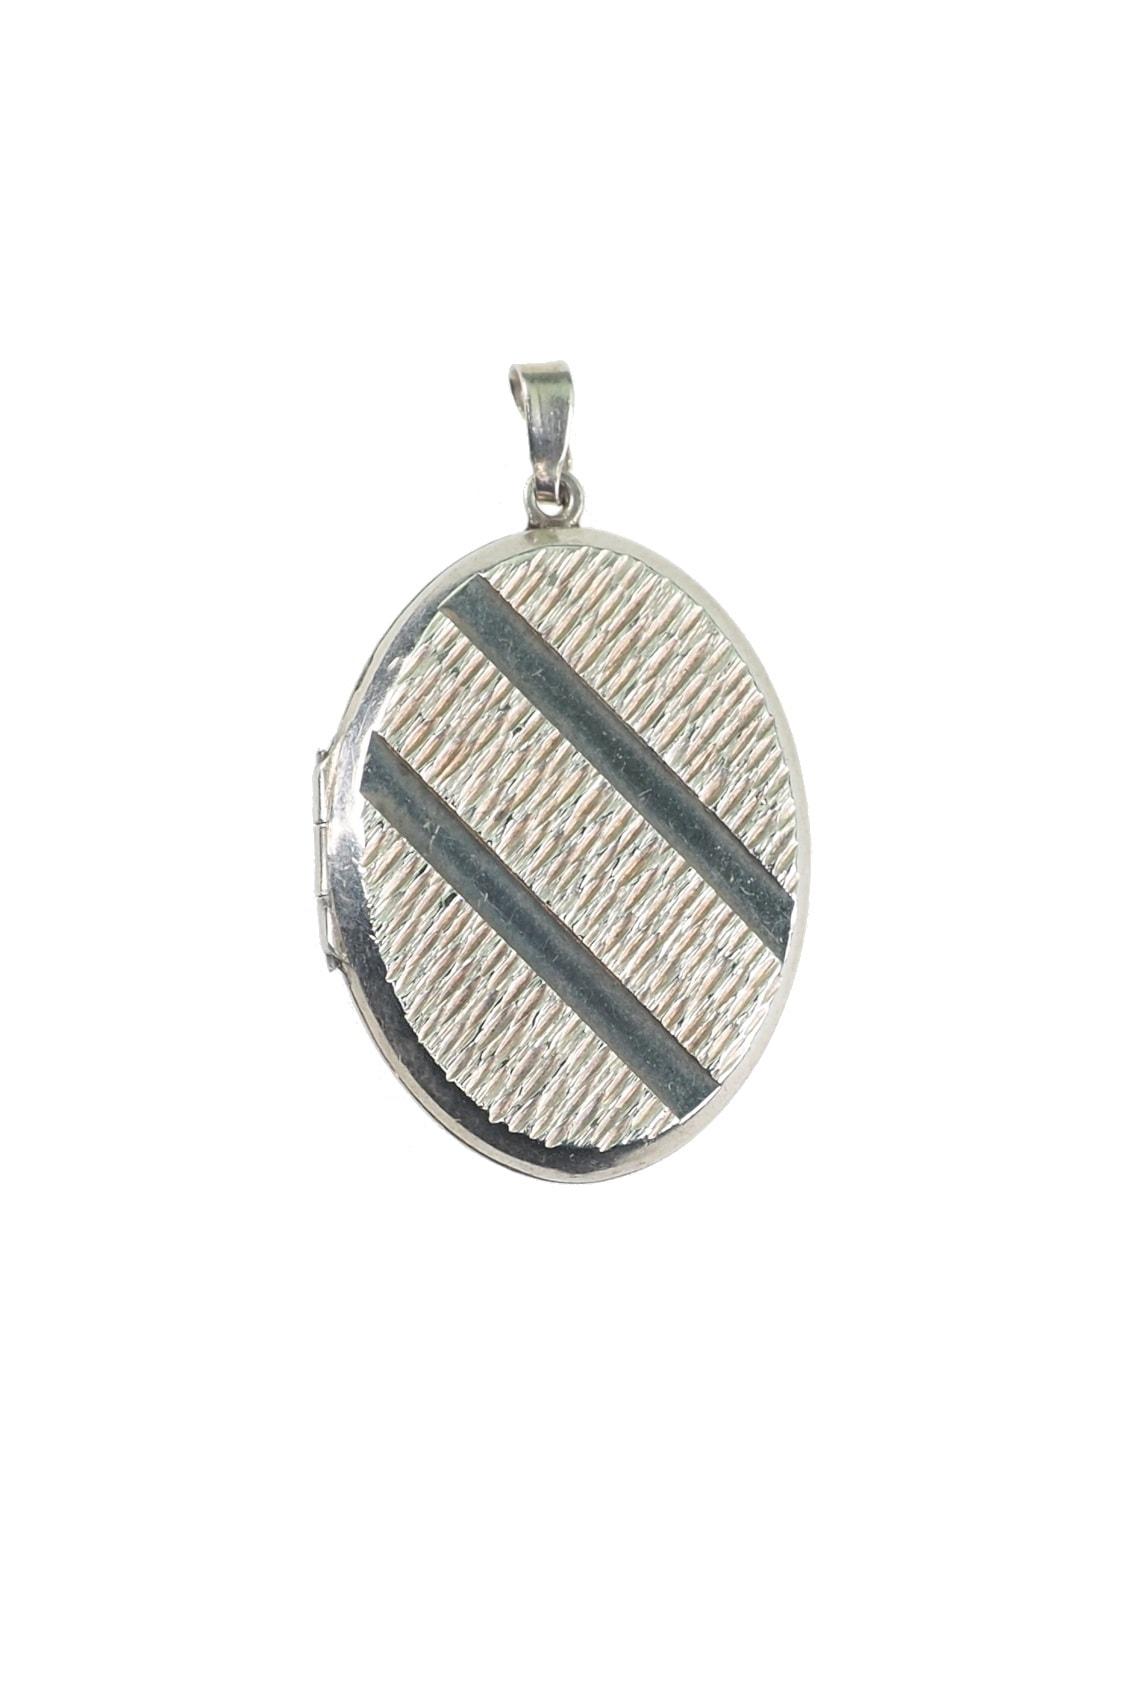 antiken-Silberschmuck-kaufen-2331